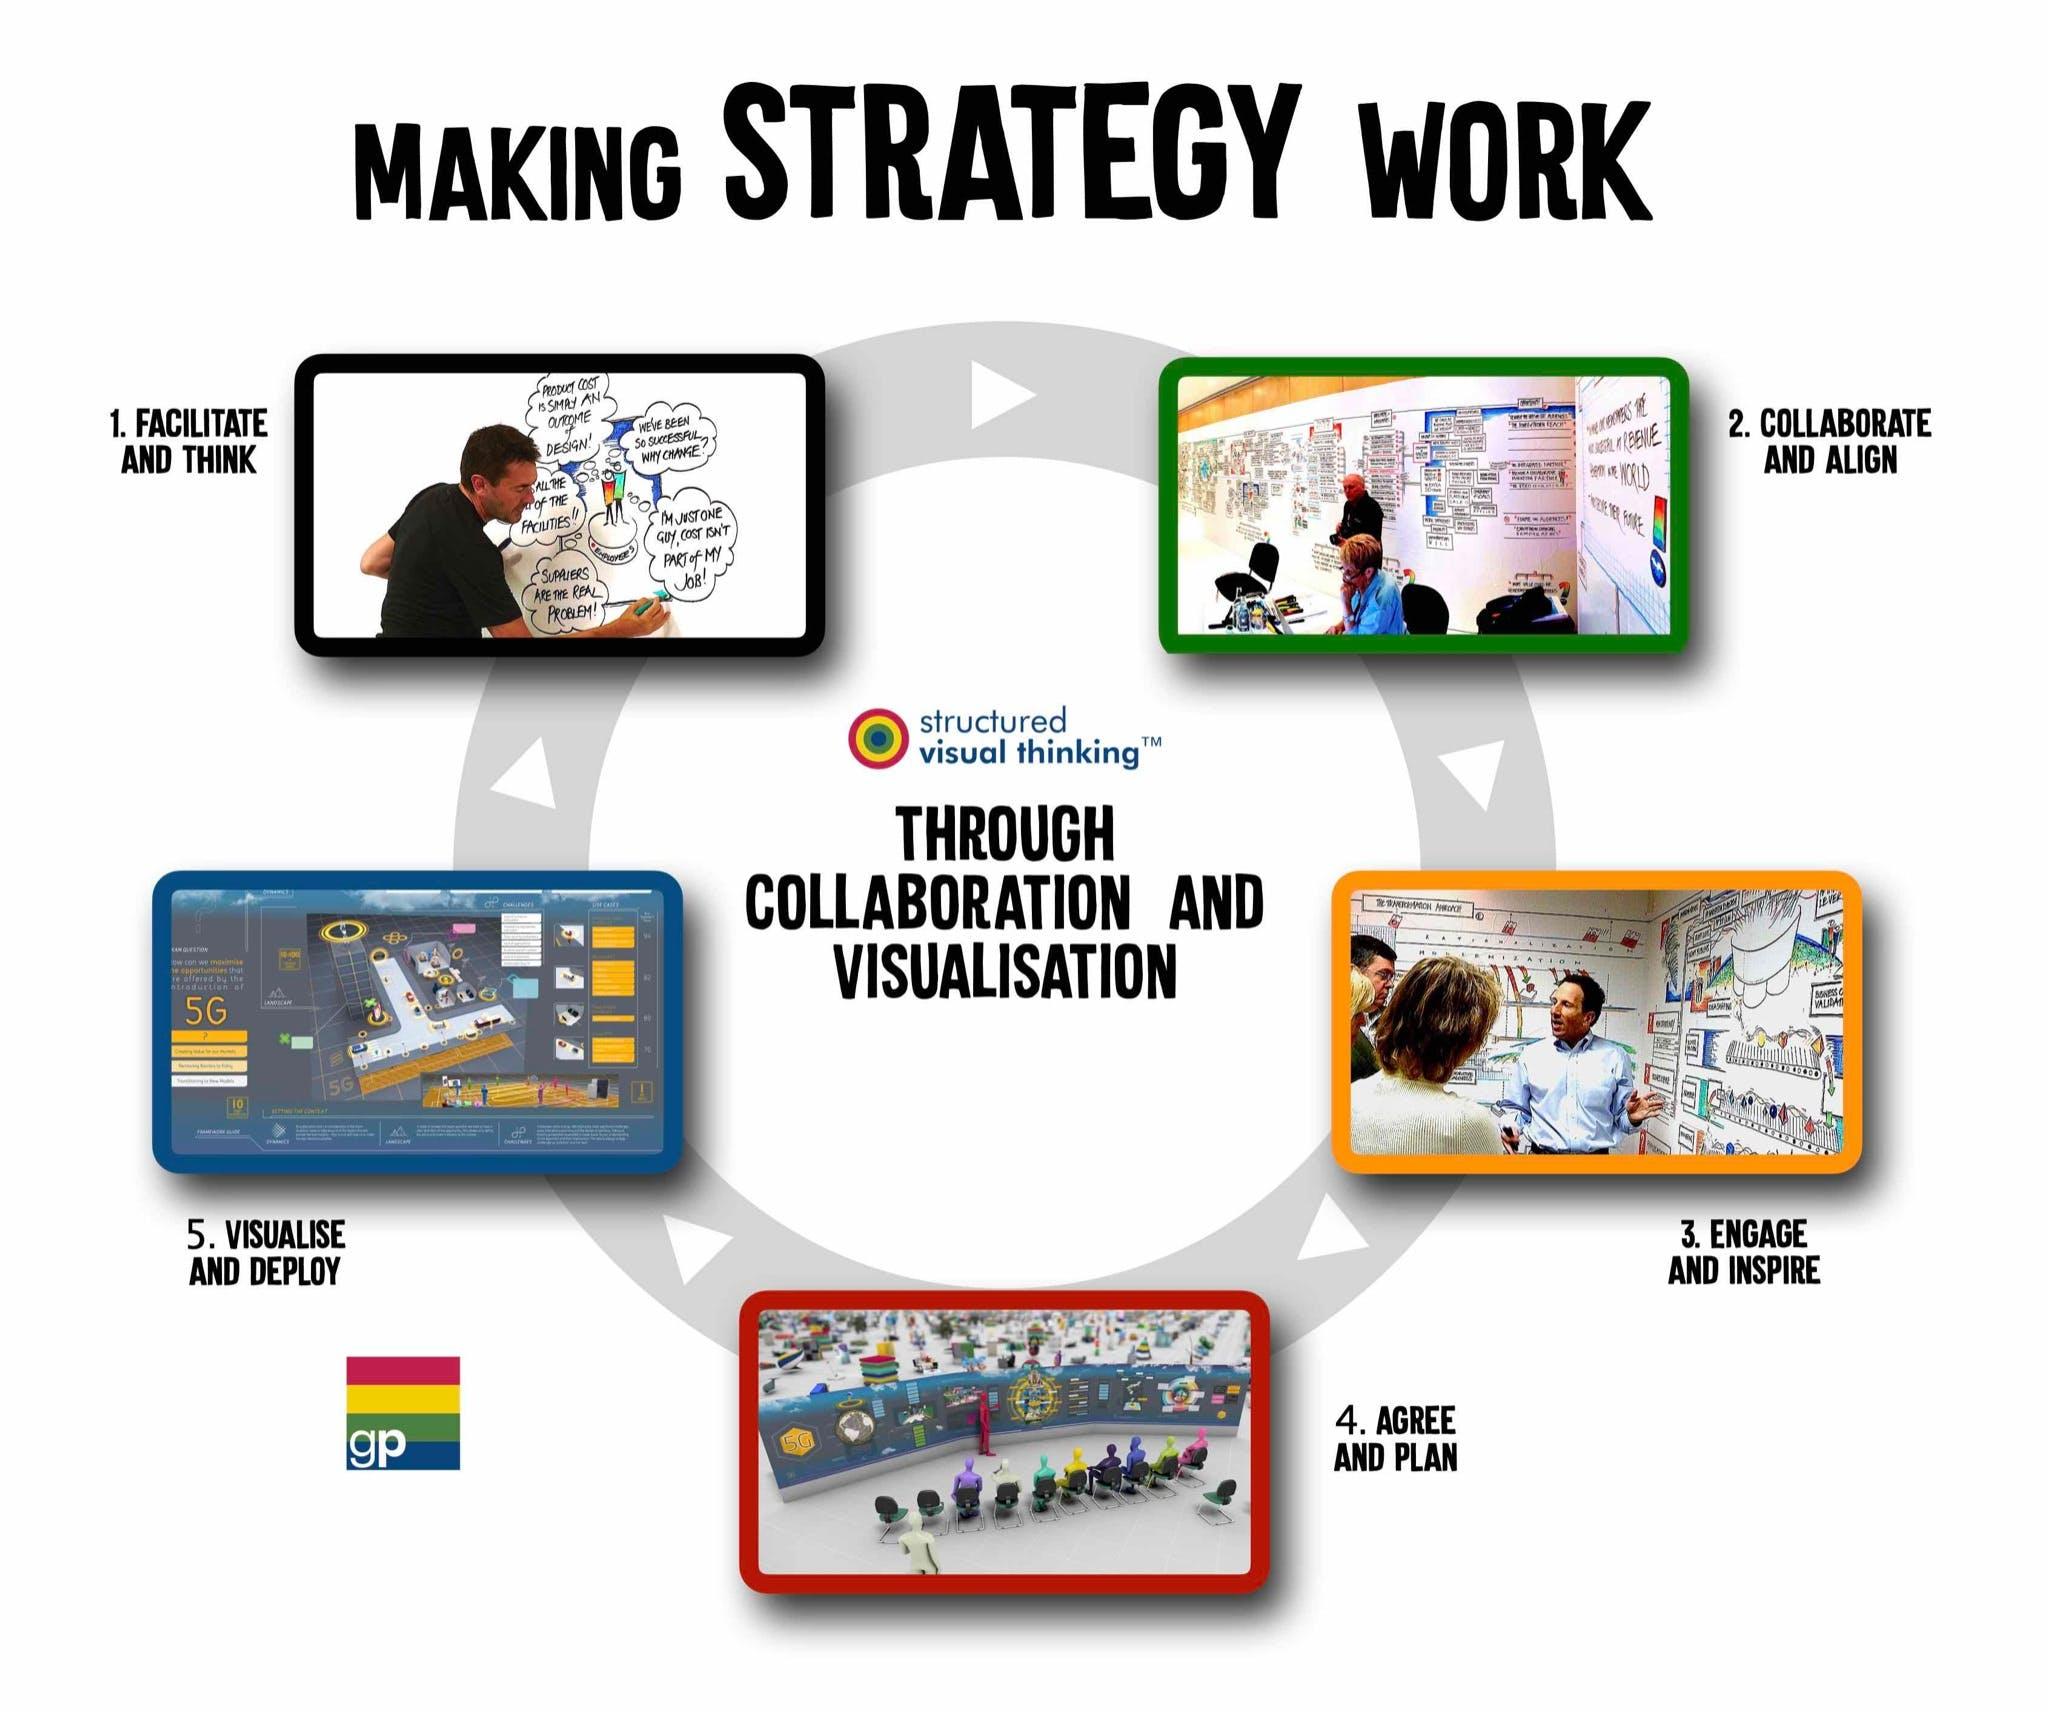 make strategy work.jpg